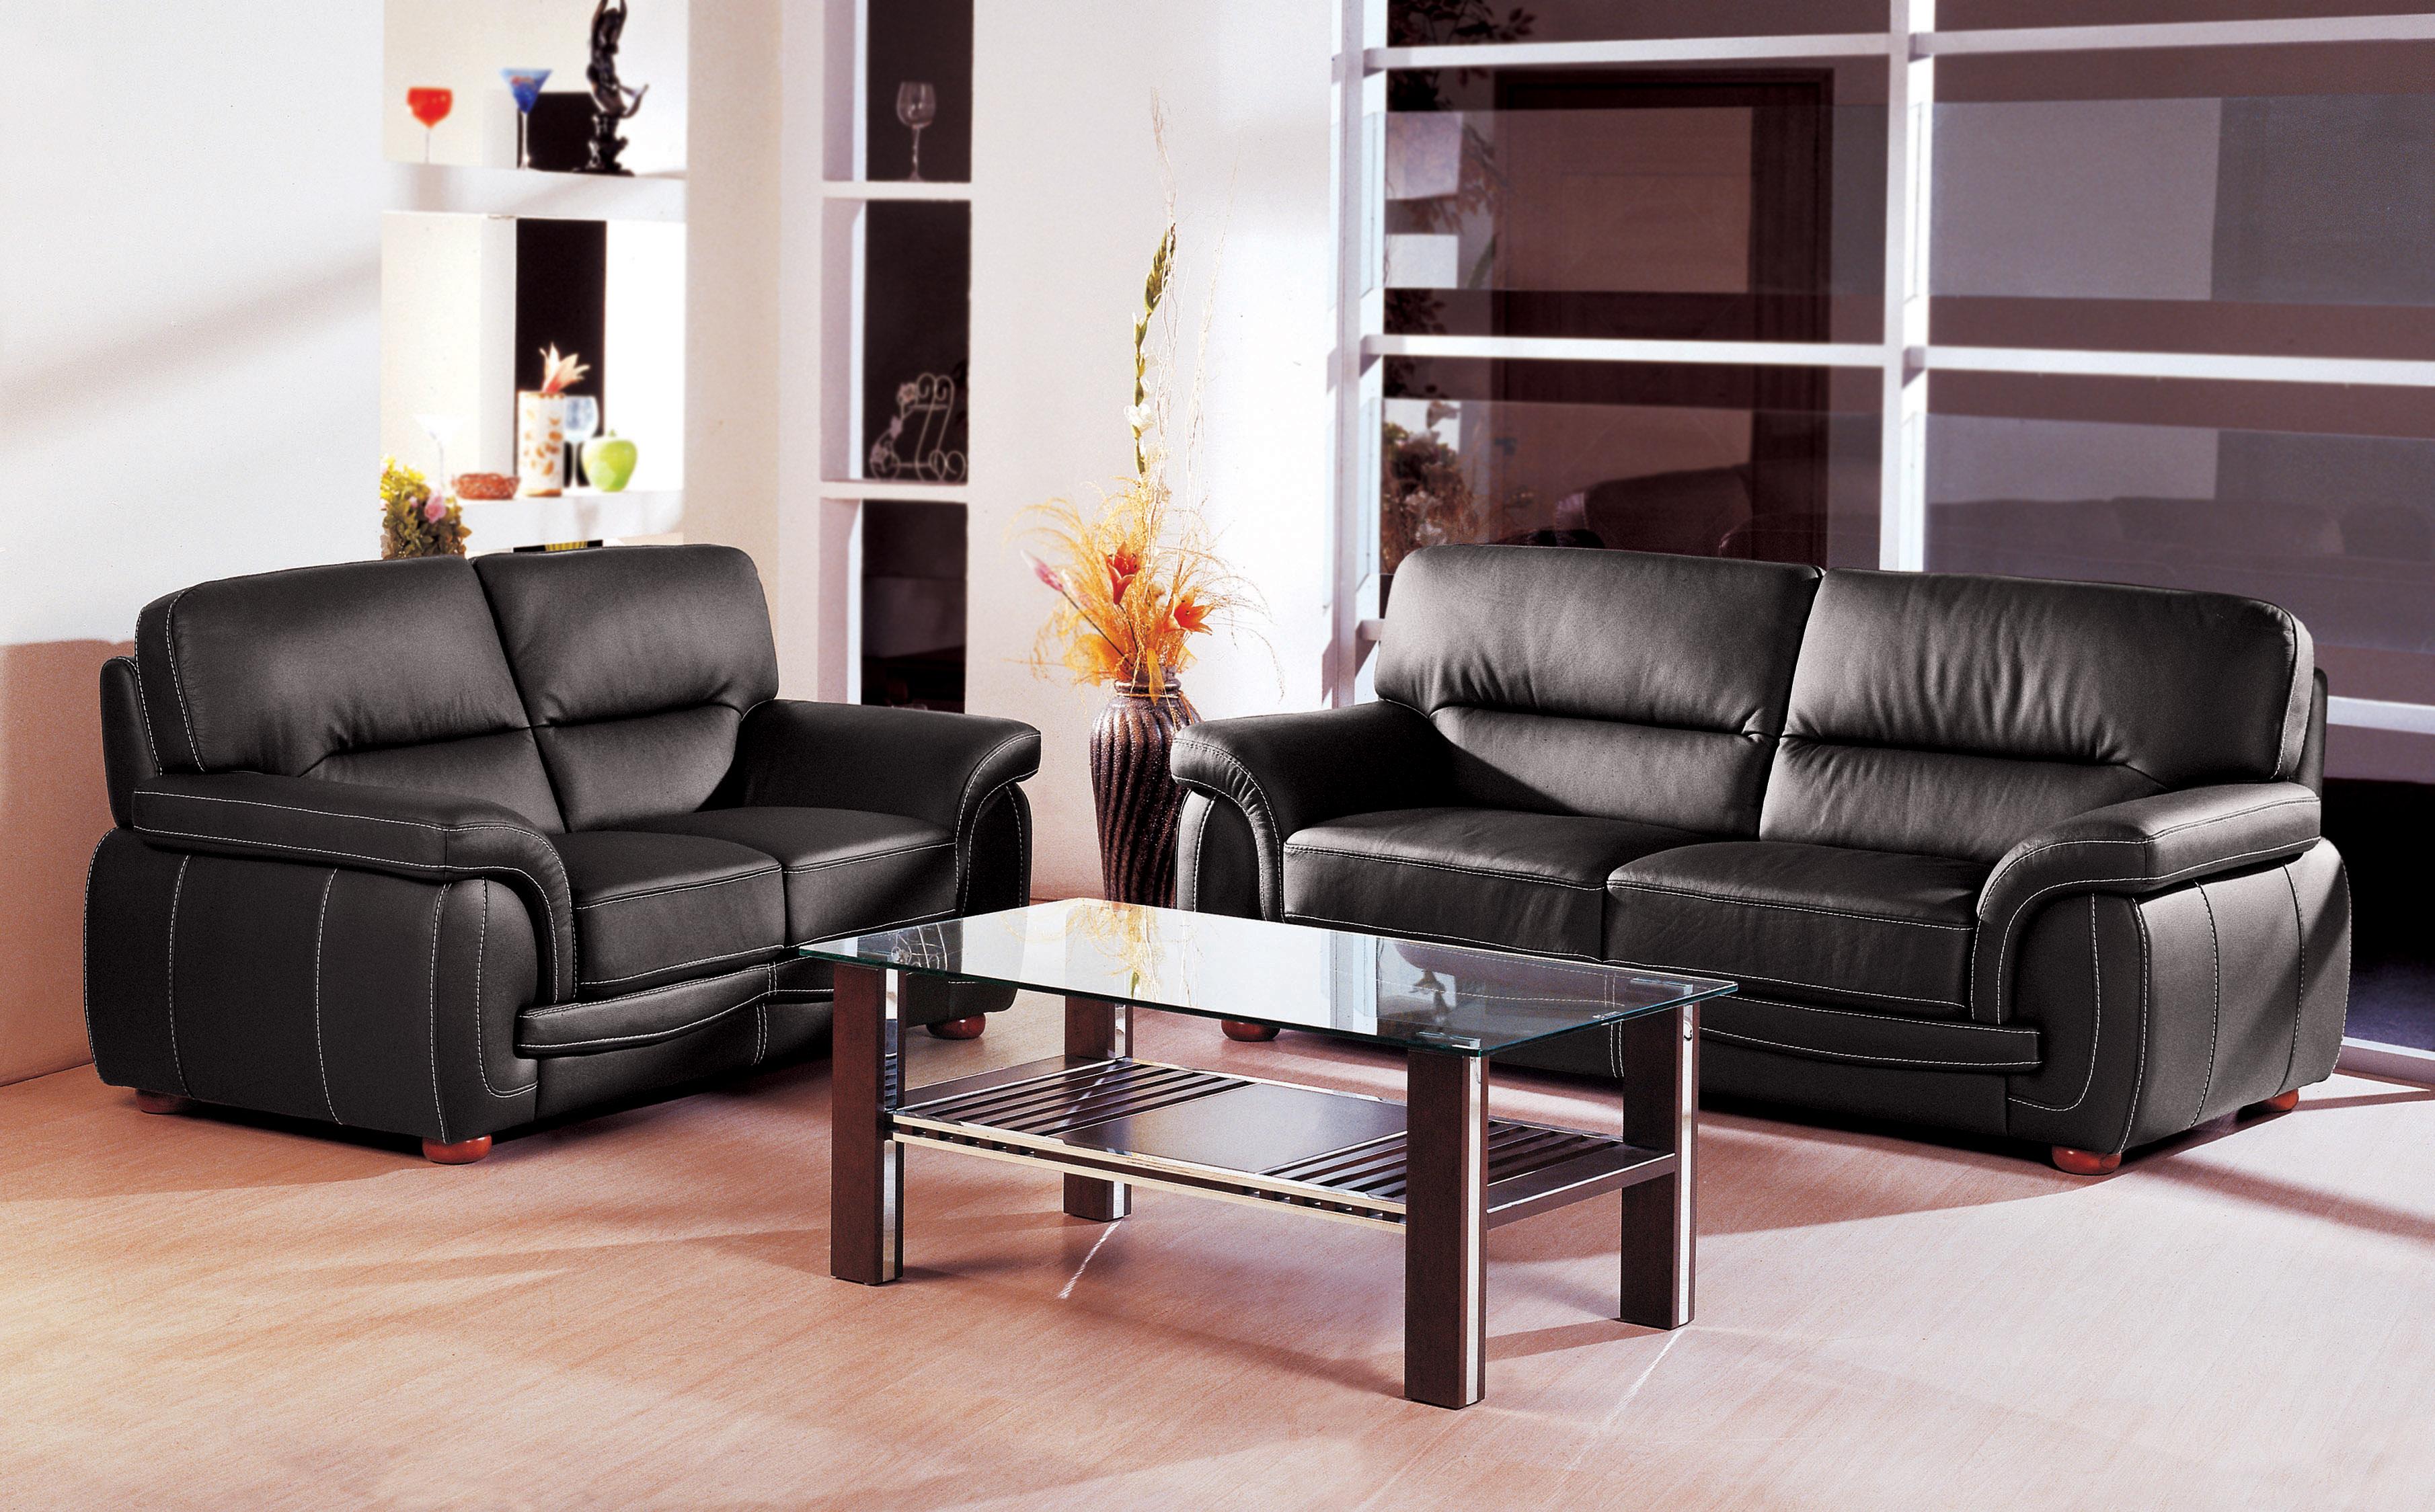 black italian leather 3 pcs sofa set garne austin texas beve